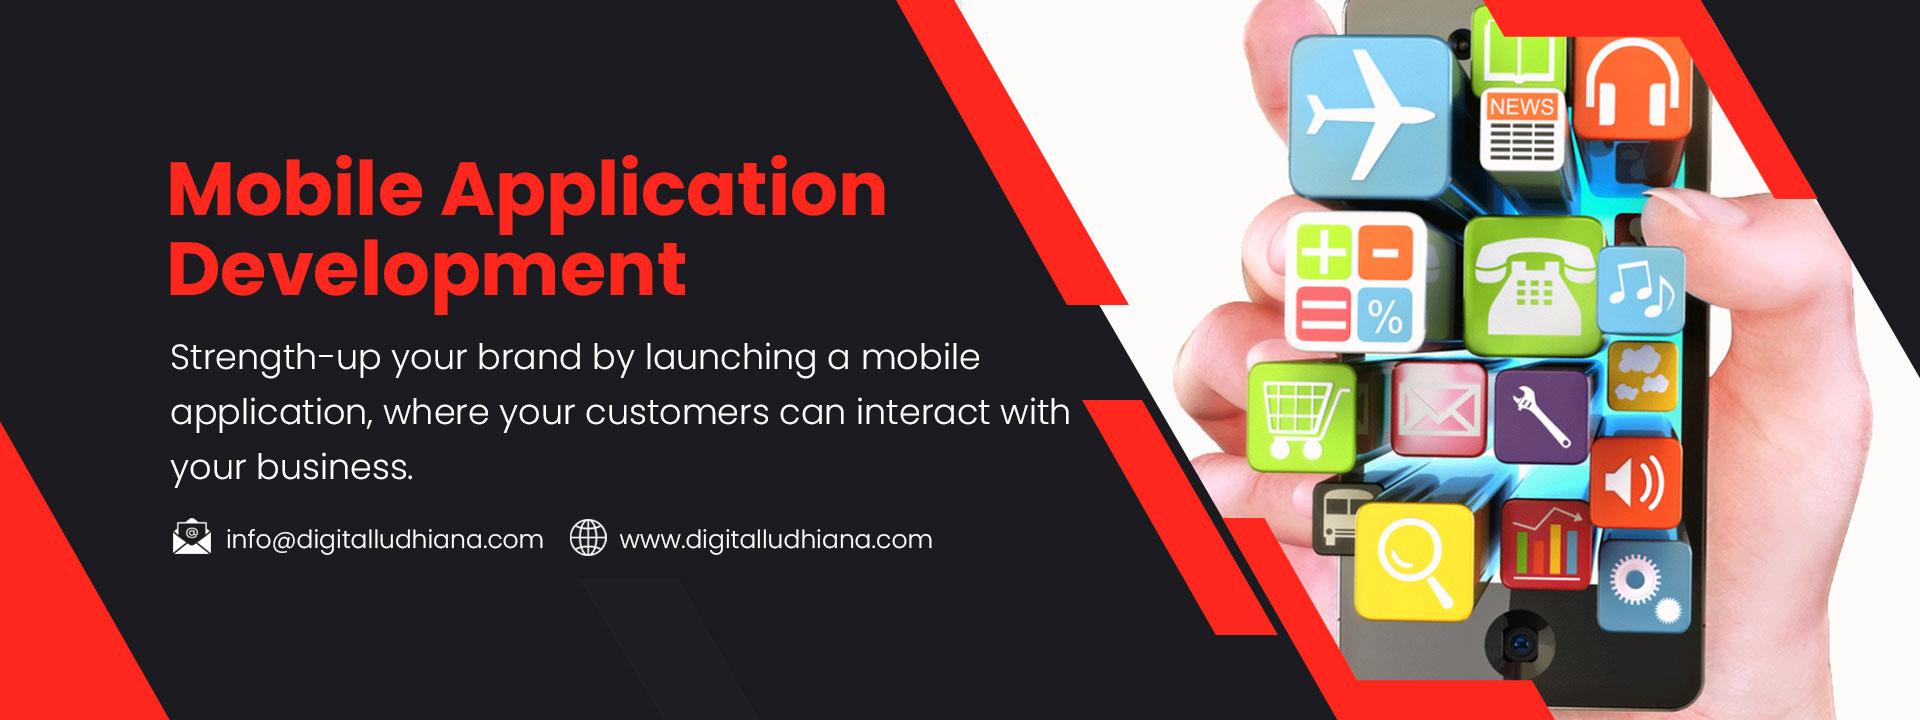 mobile application development services in ludhiana punjab india